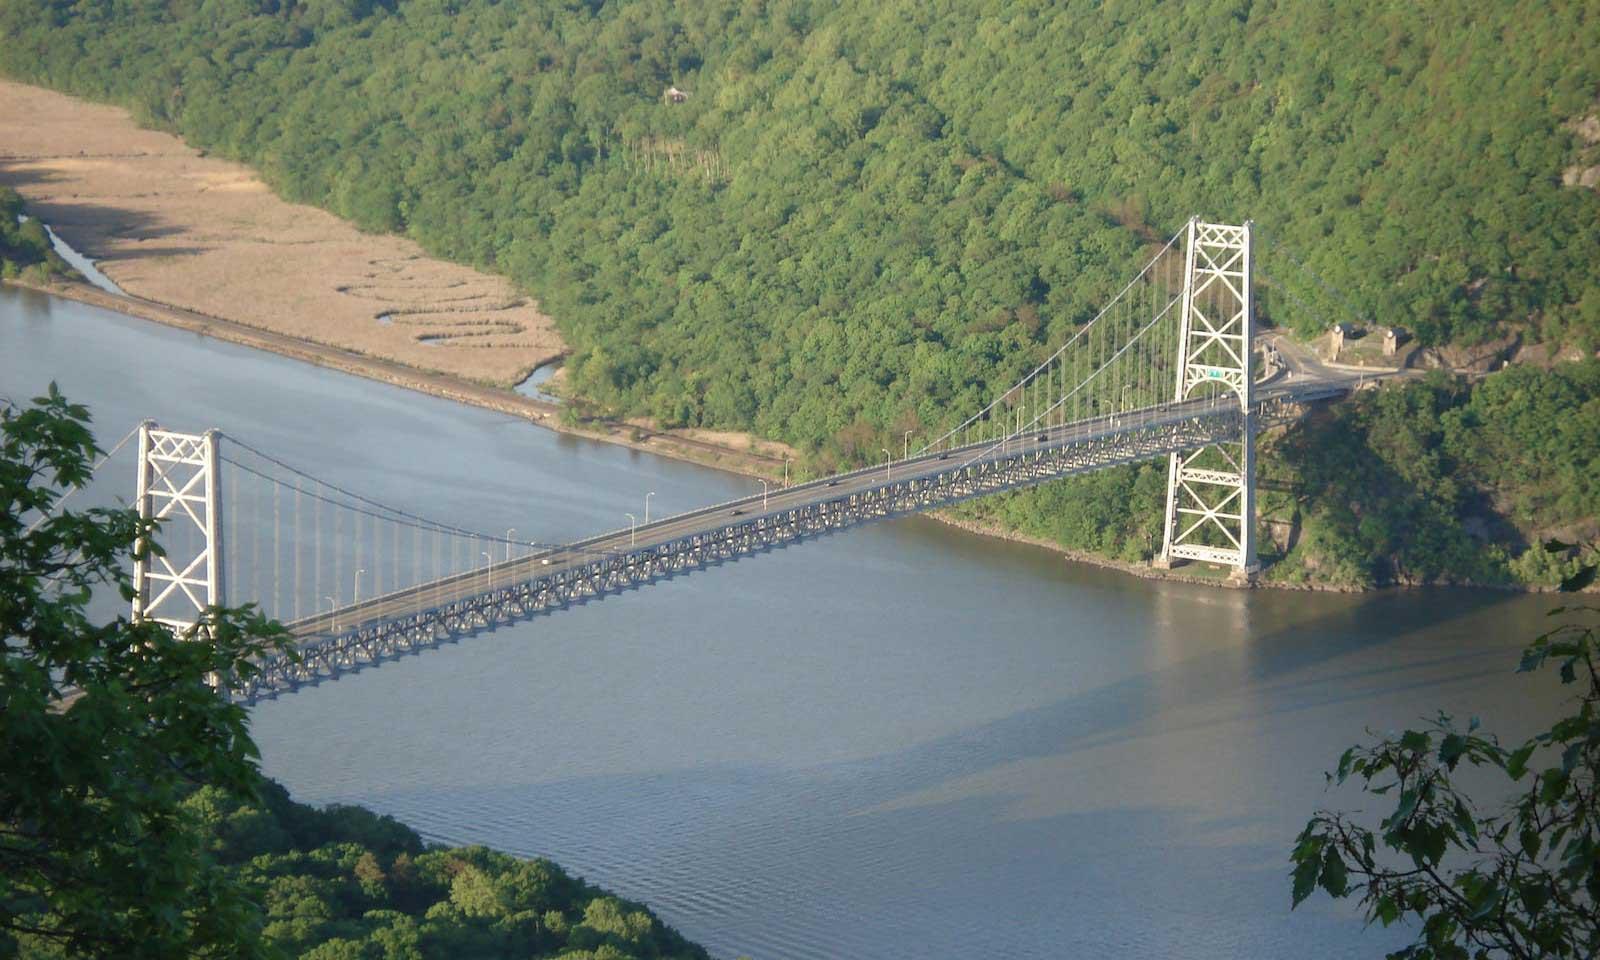 george washington bridge from above